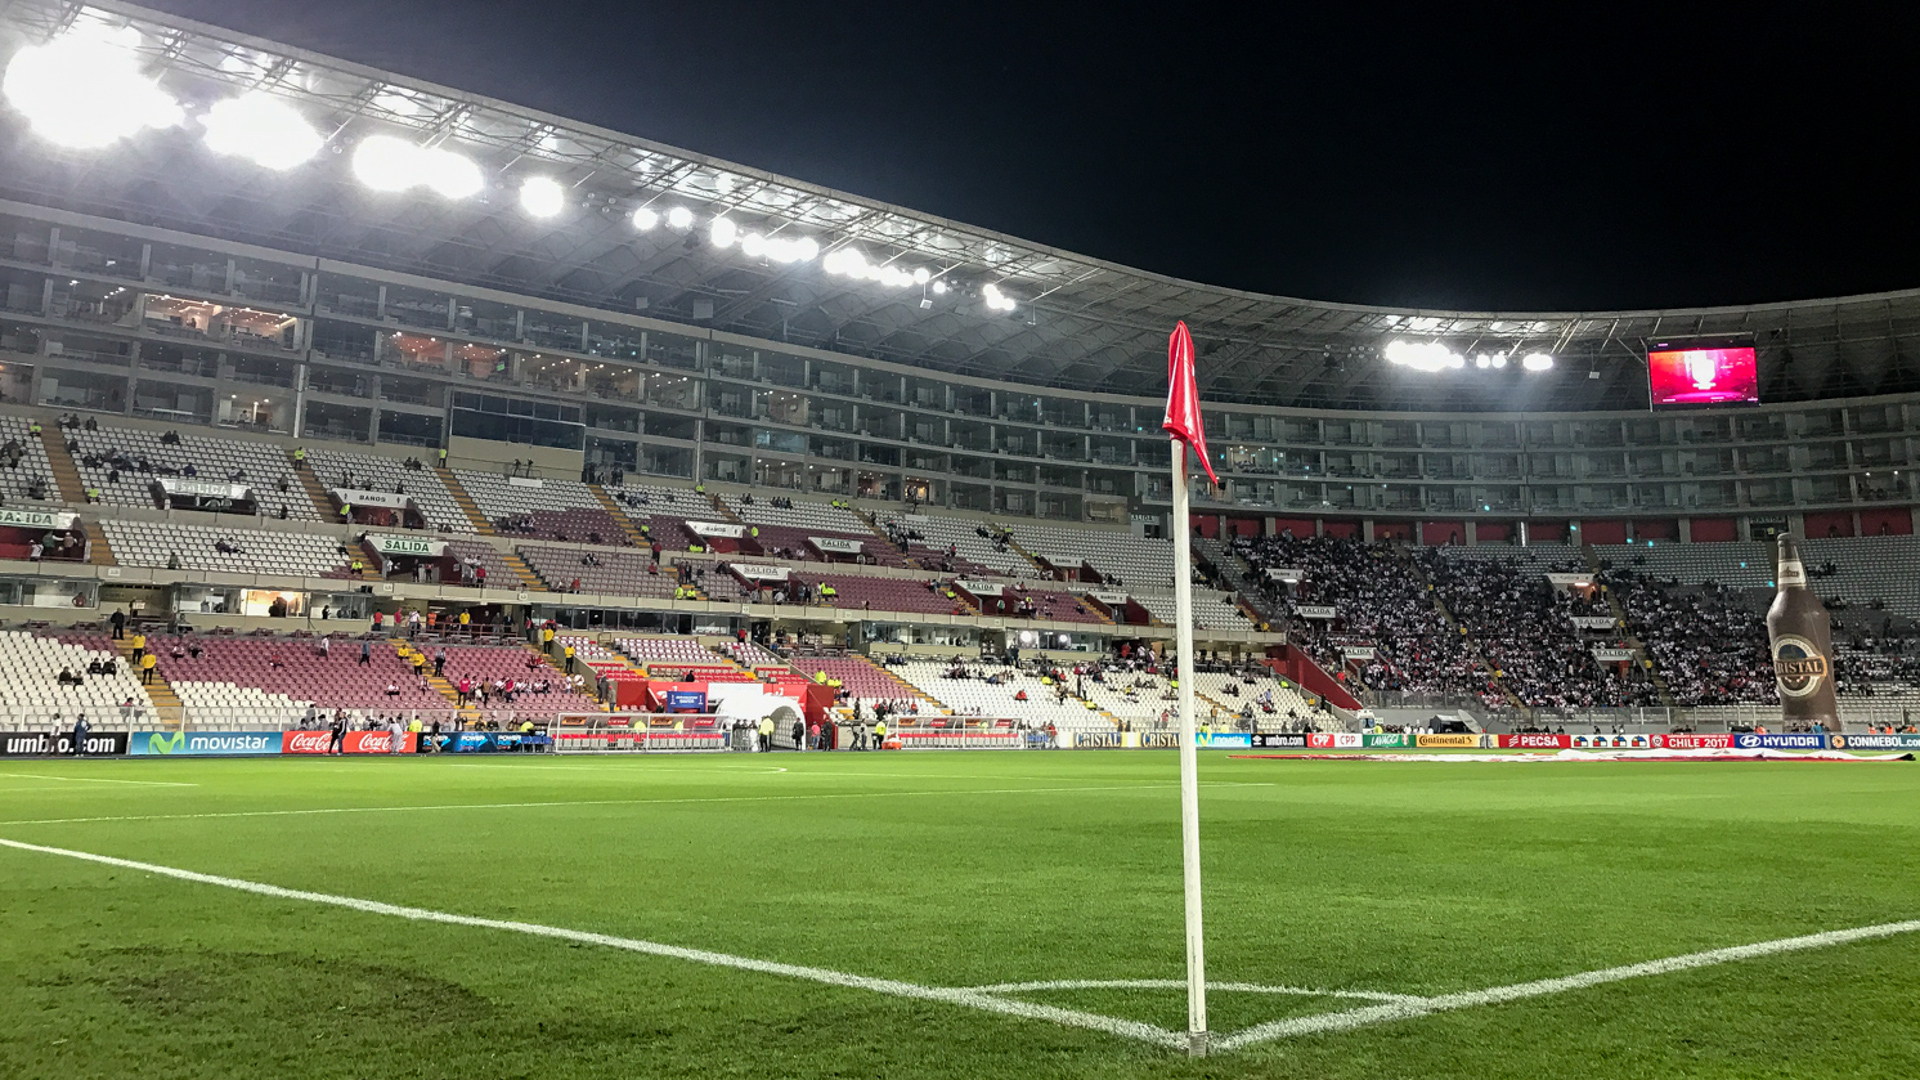 Estadio Nacional Lima Peru Brasil Eliminatorias 2018 16112016